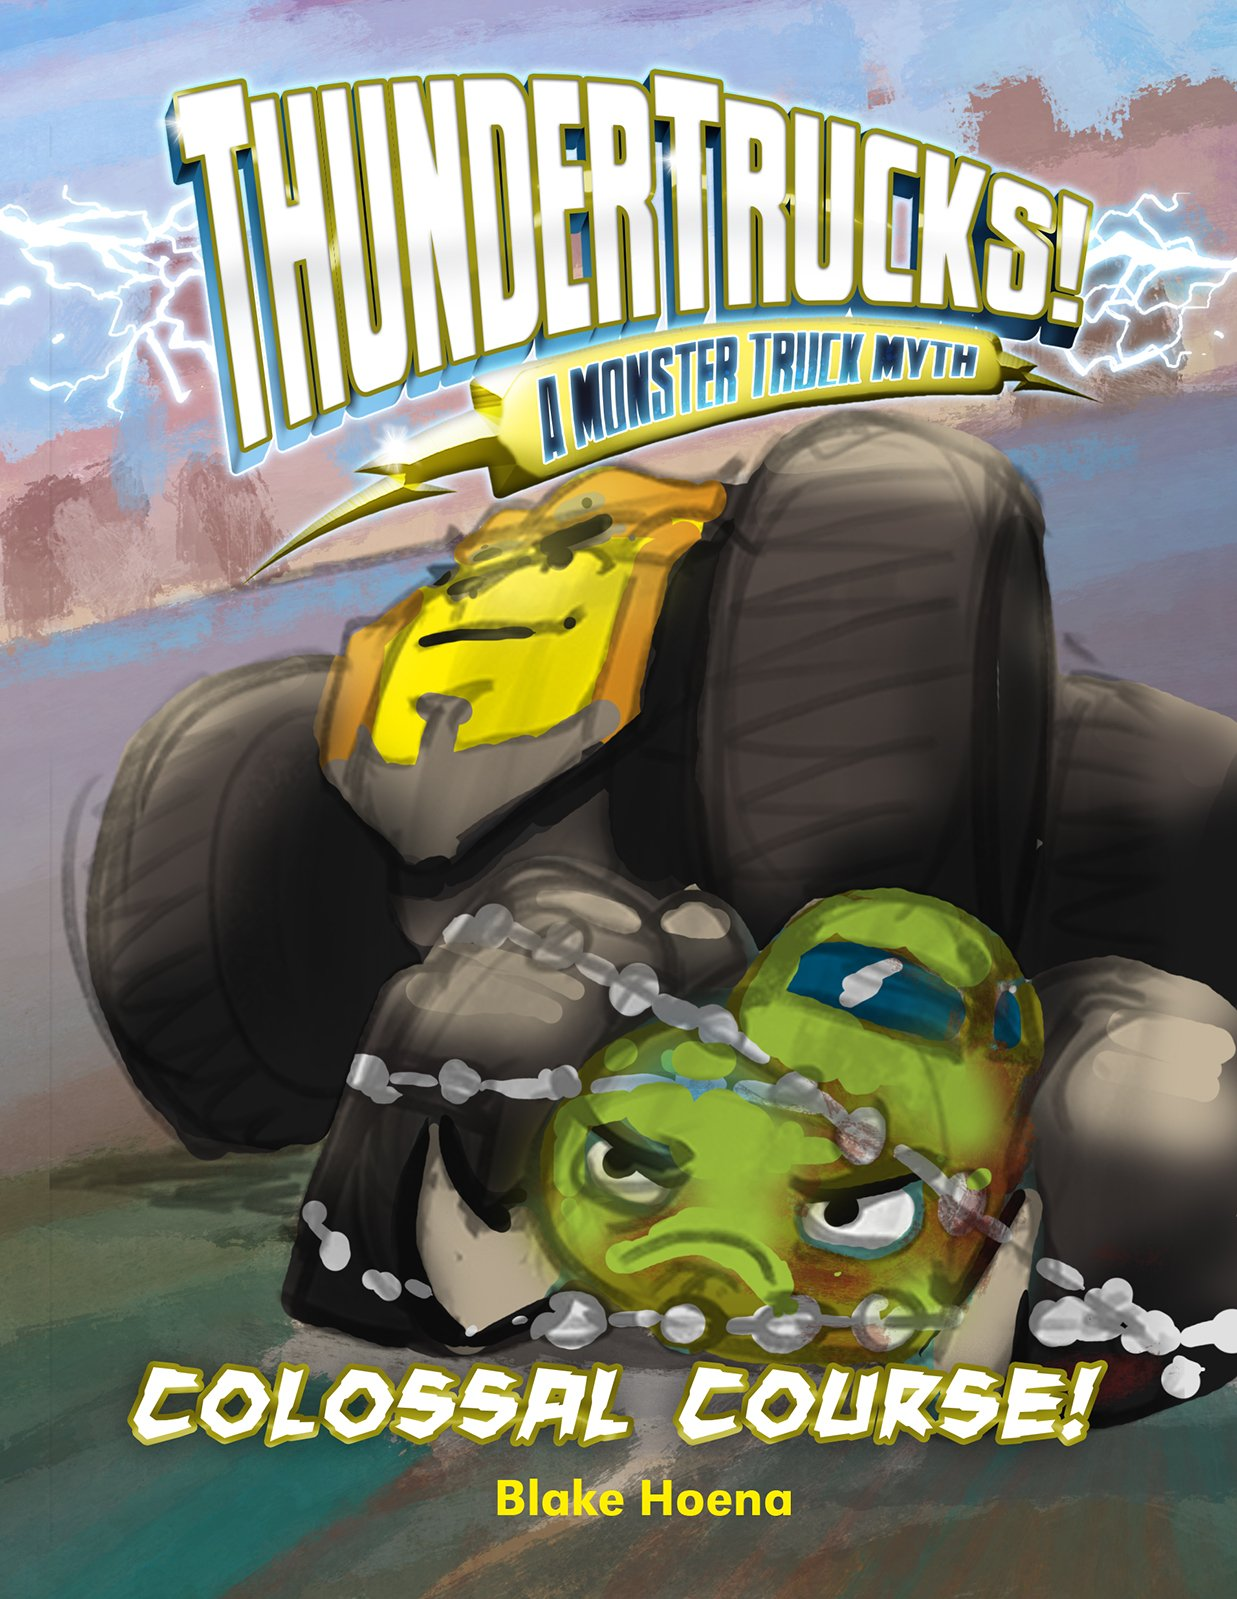 Colossal Course!: A Monster Truck Myth (ThunderTrucks!)